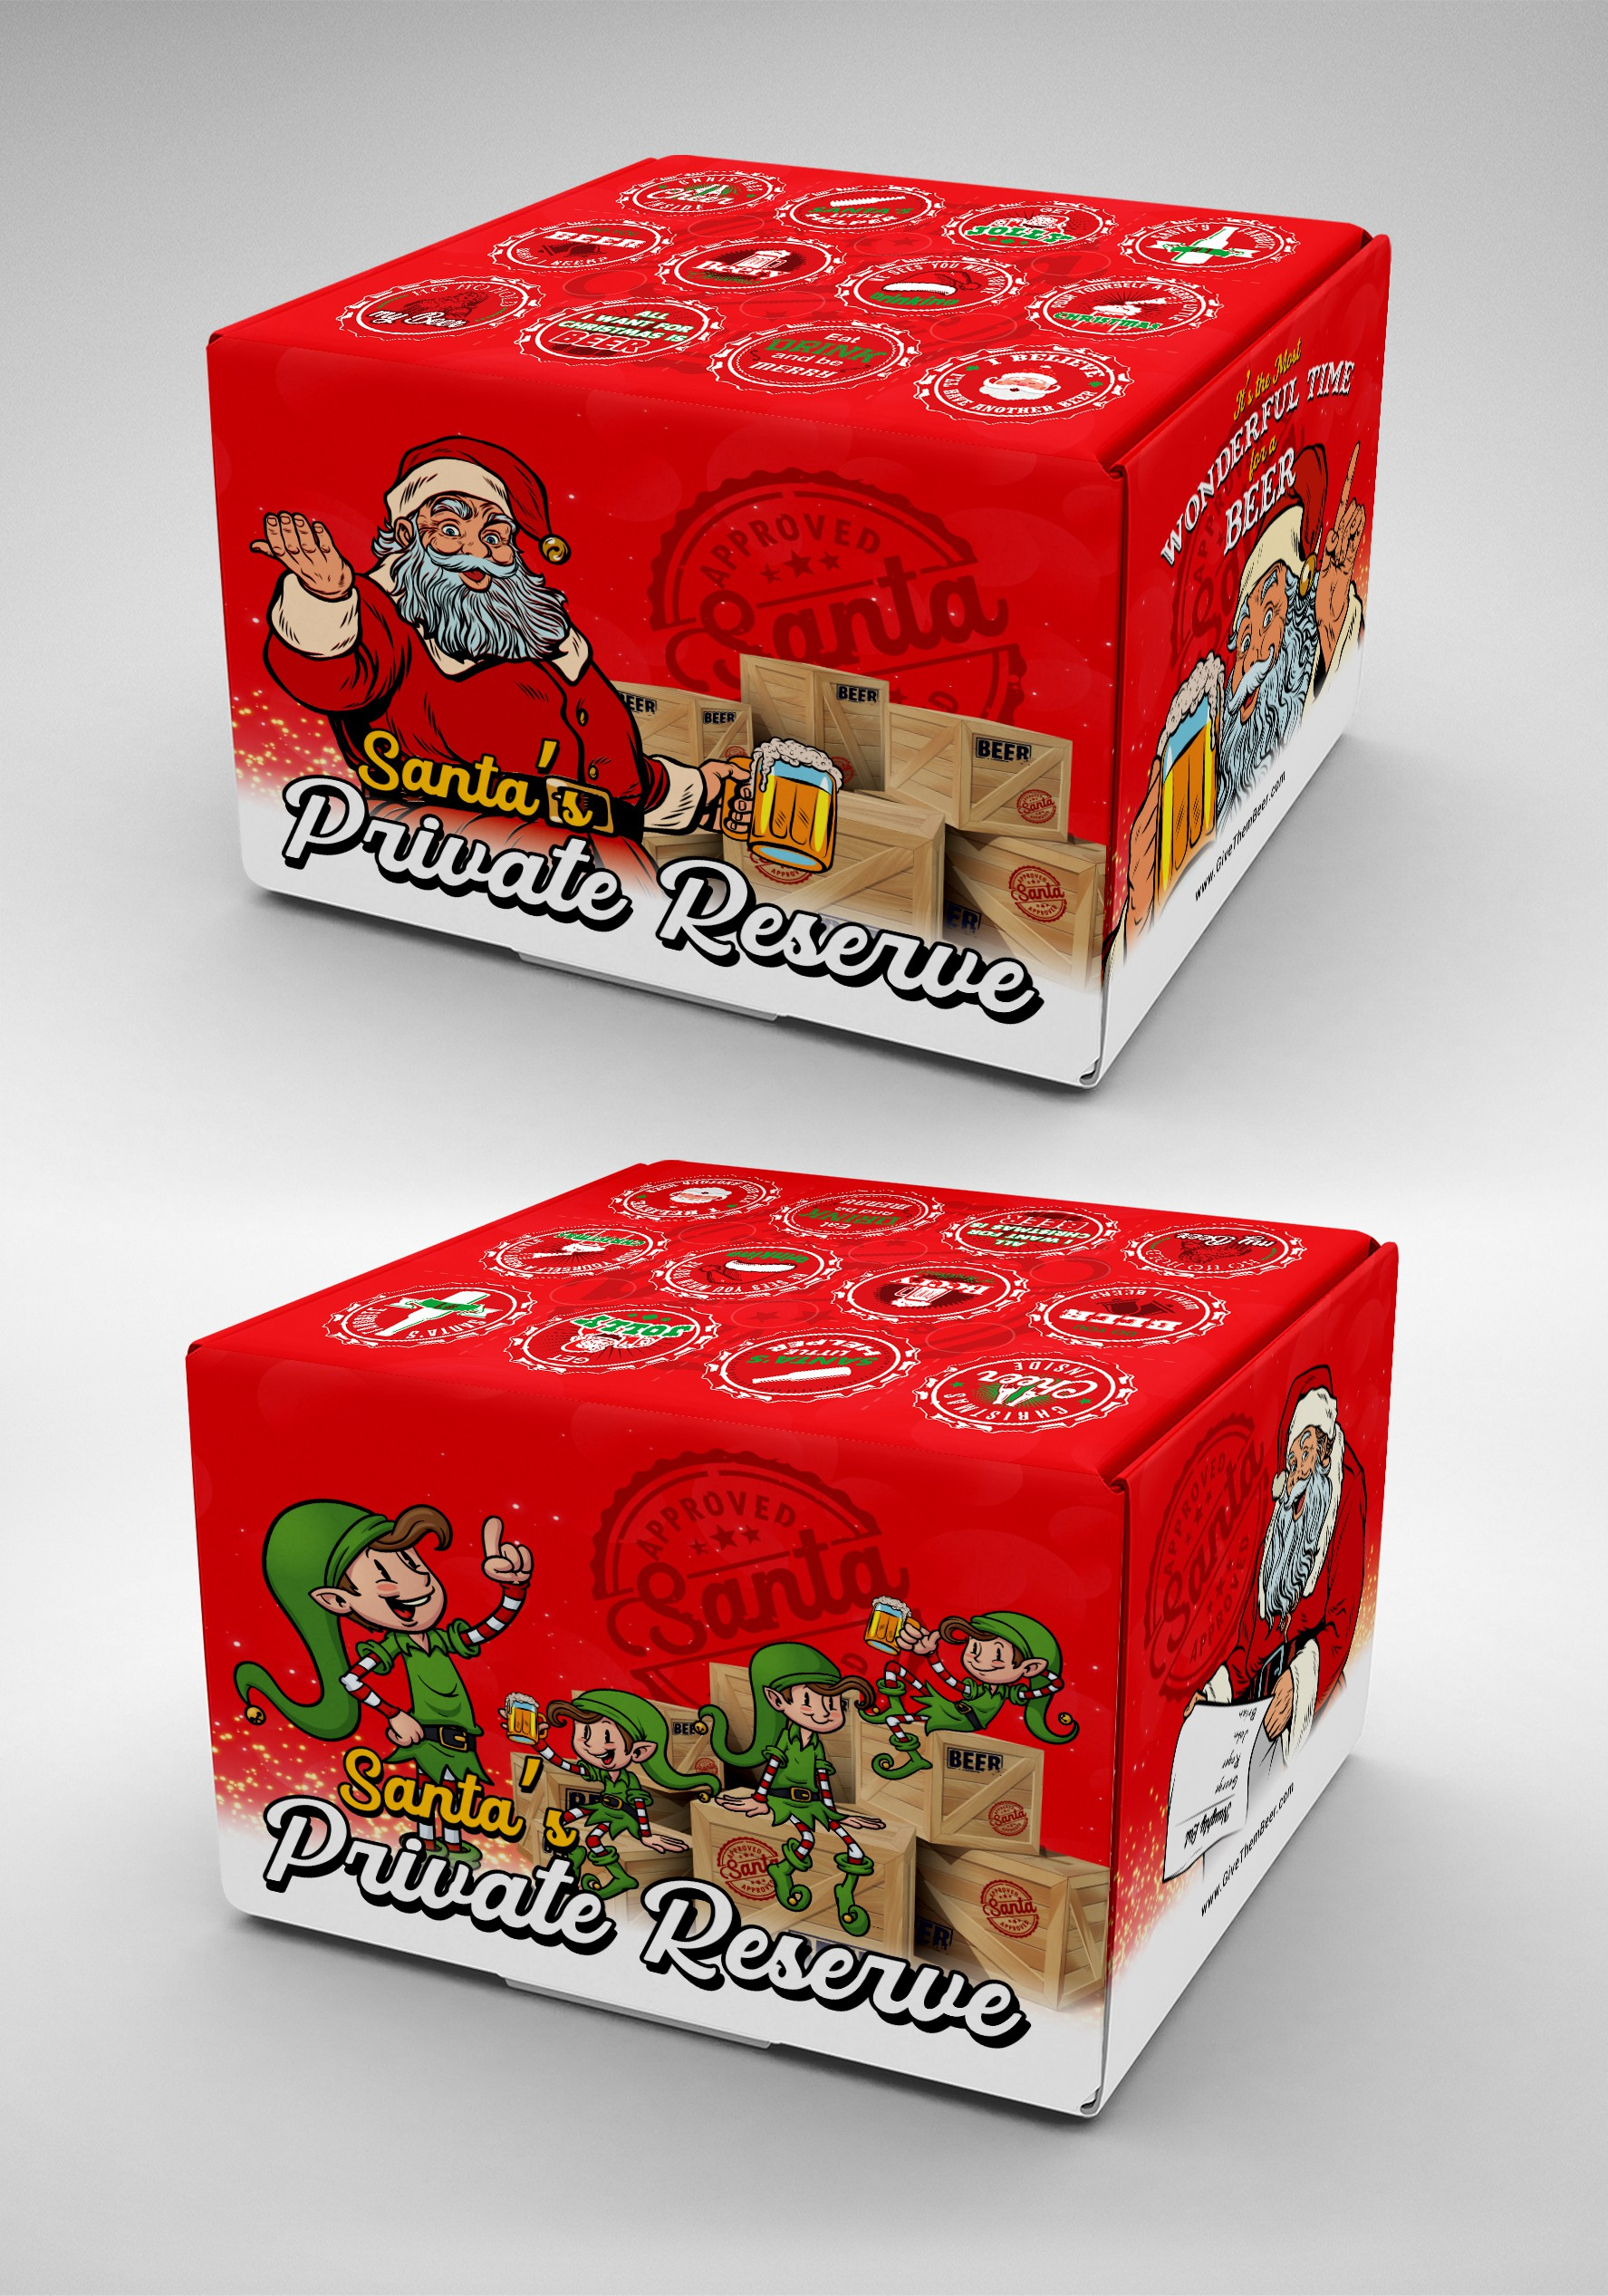 Santa's Private Reserve Beer Box